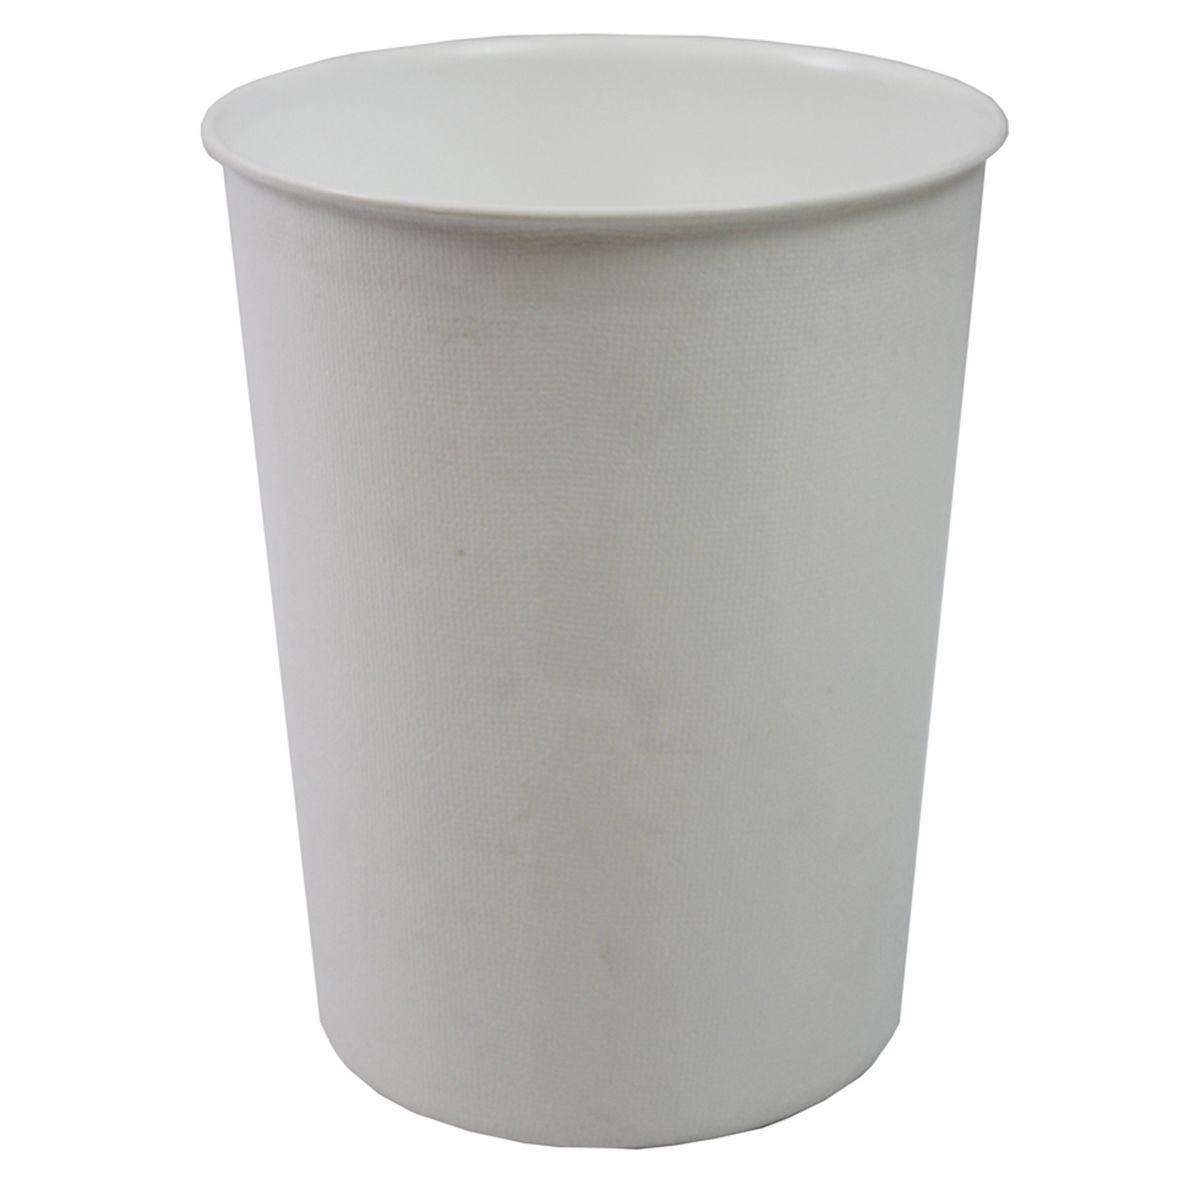 JVL Quality Vibrance Lightweight Waste Paper Basket Bin Plastic White